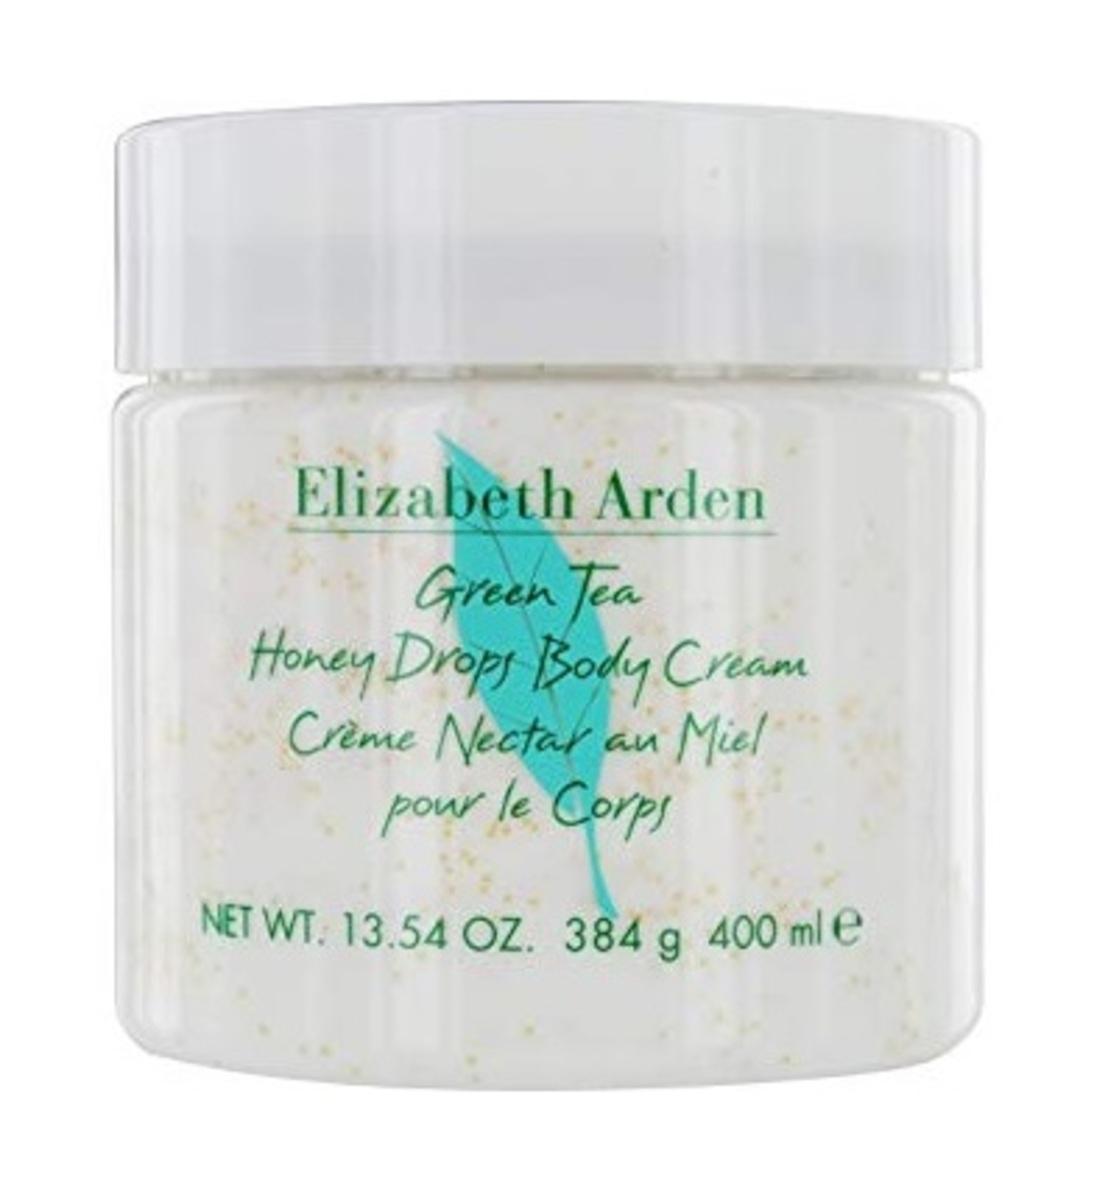 Green Tea Honey Drops Body Cream 400ml